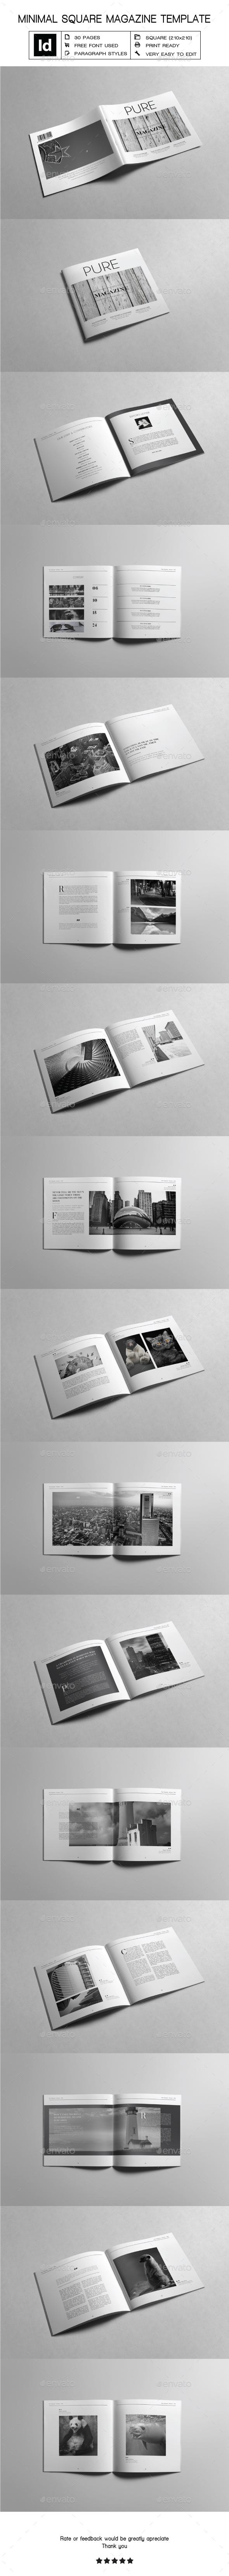 Minimal Square Magazine Template II - Magazines Print Templates